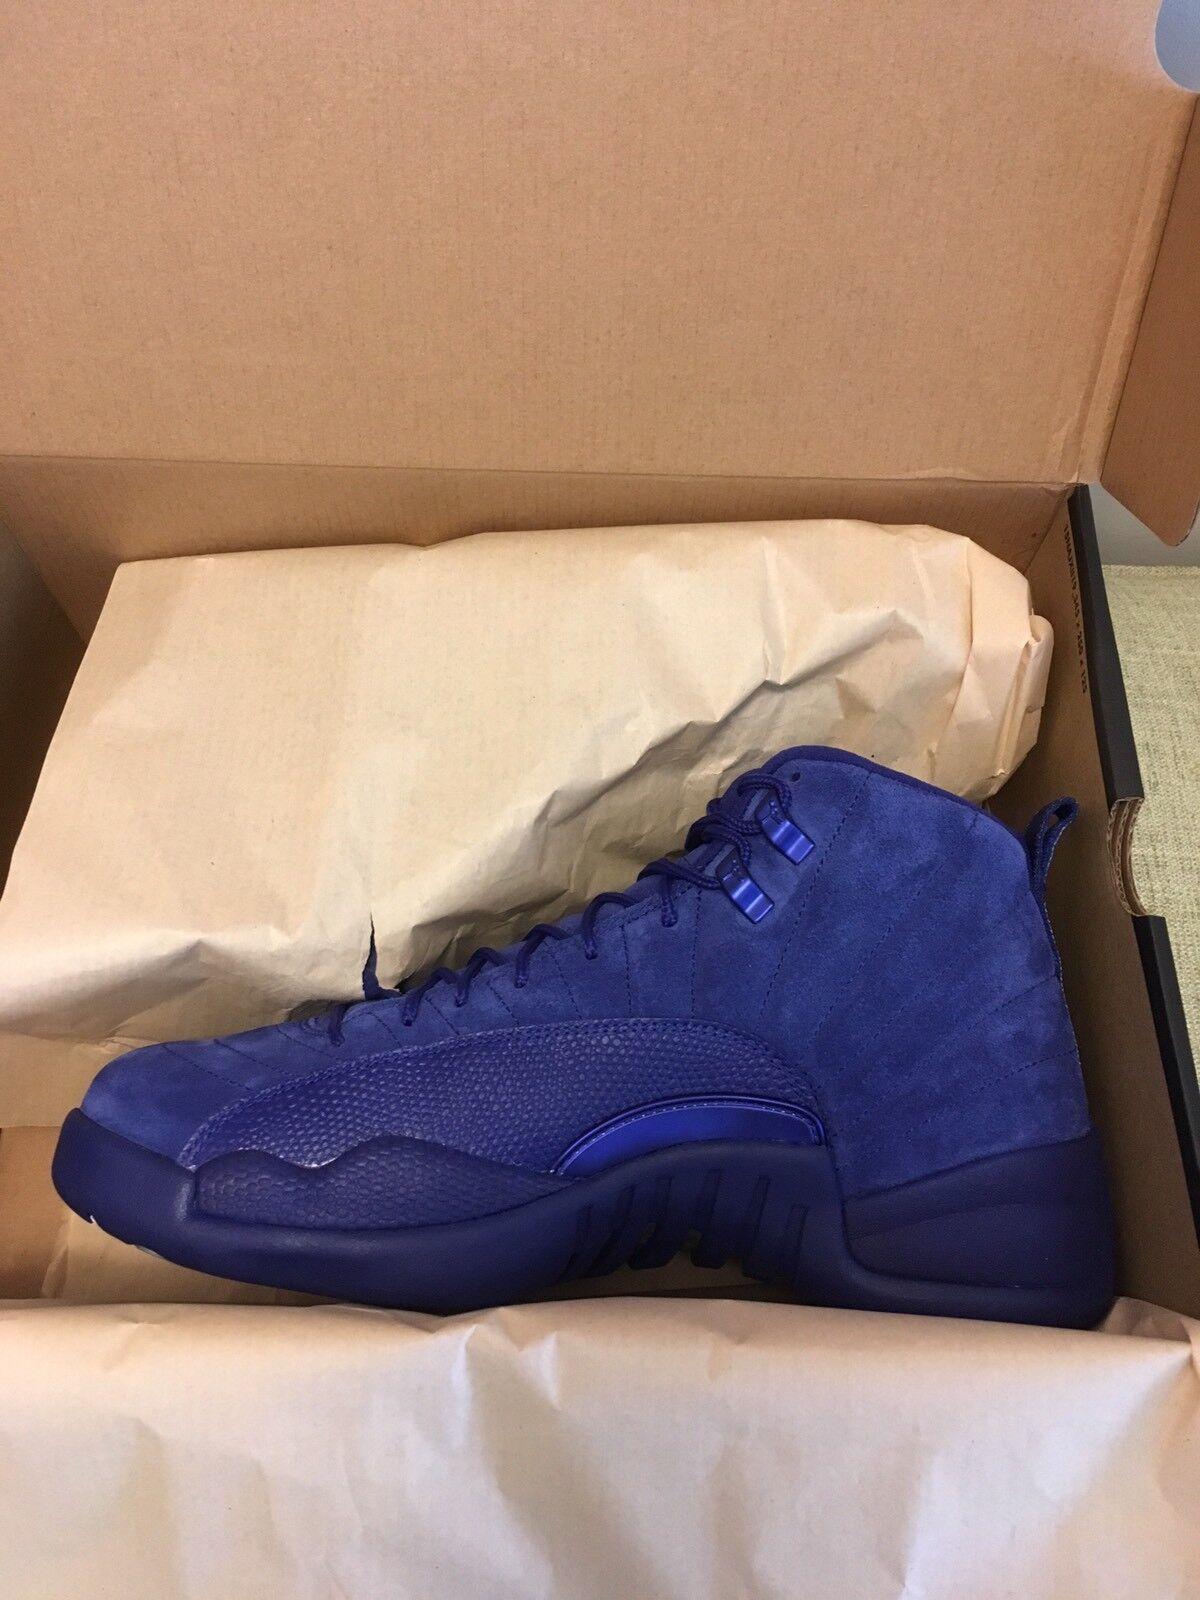 Nike Air Jordan 12 Retro Deep Royal bluee White